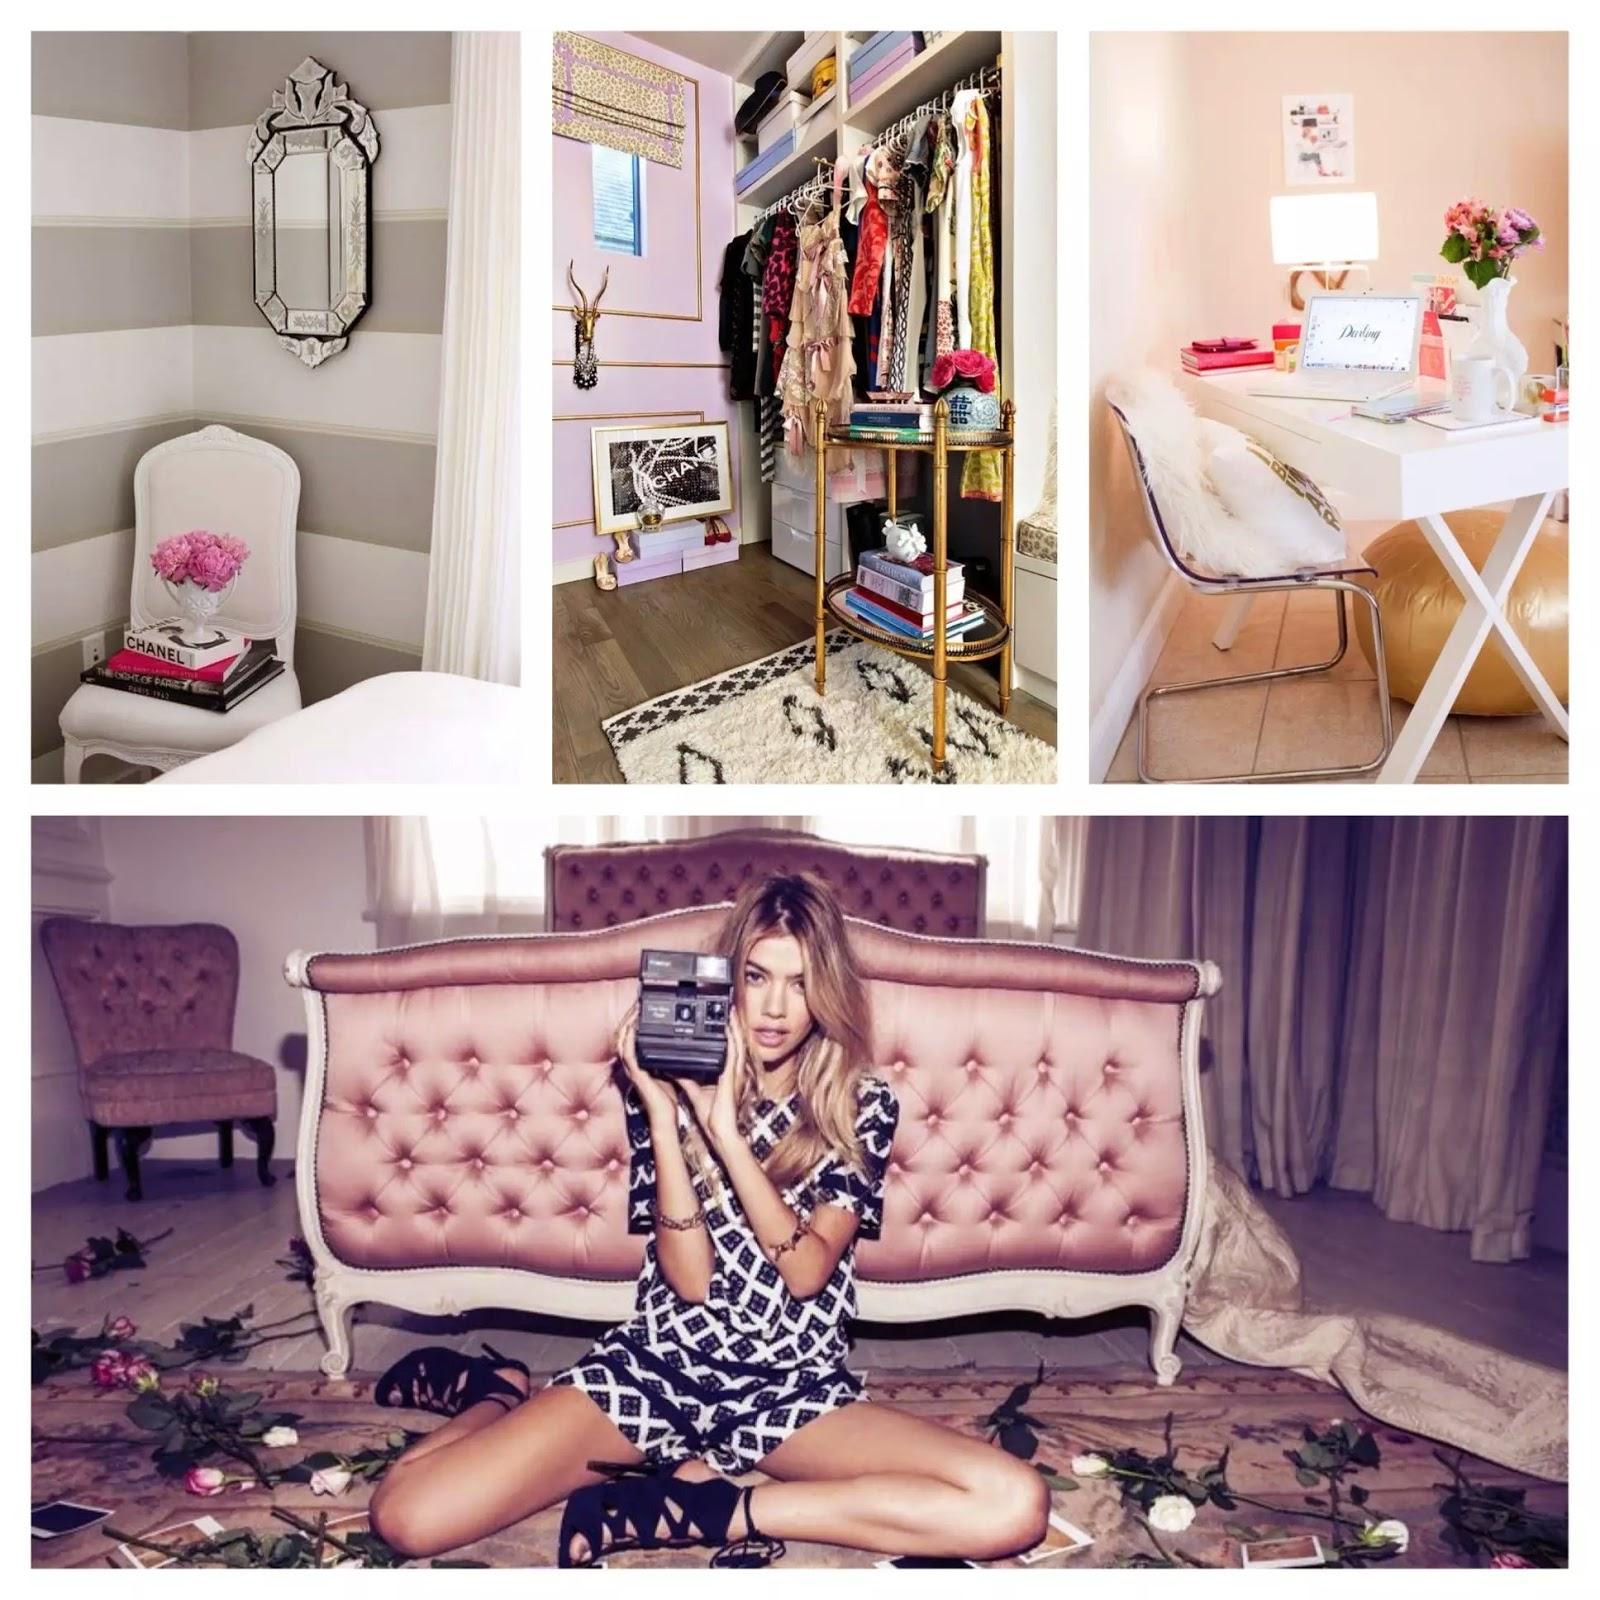 home decor, interior design, pinterest, chic, minimalist